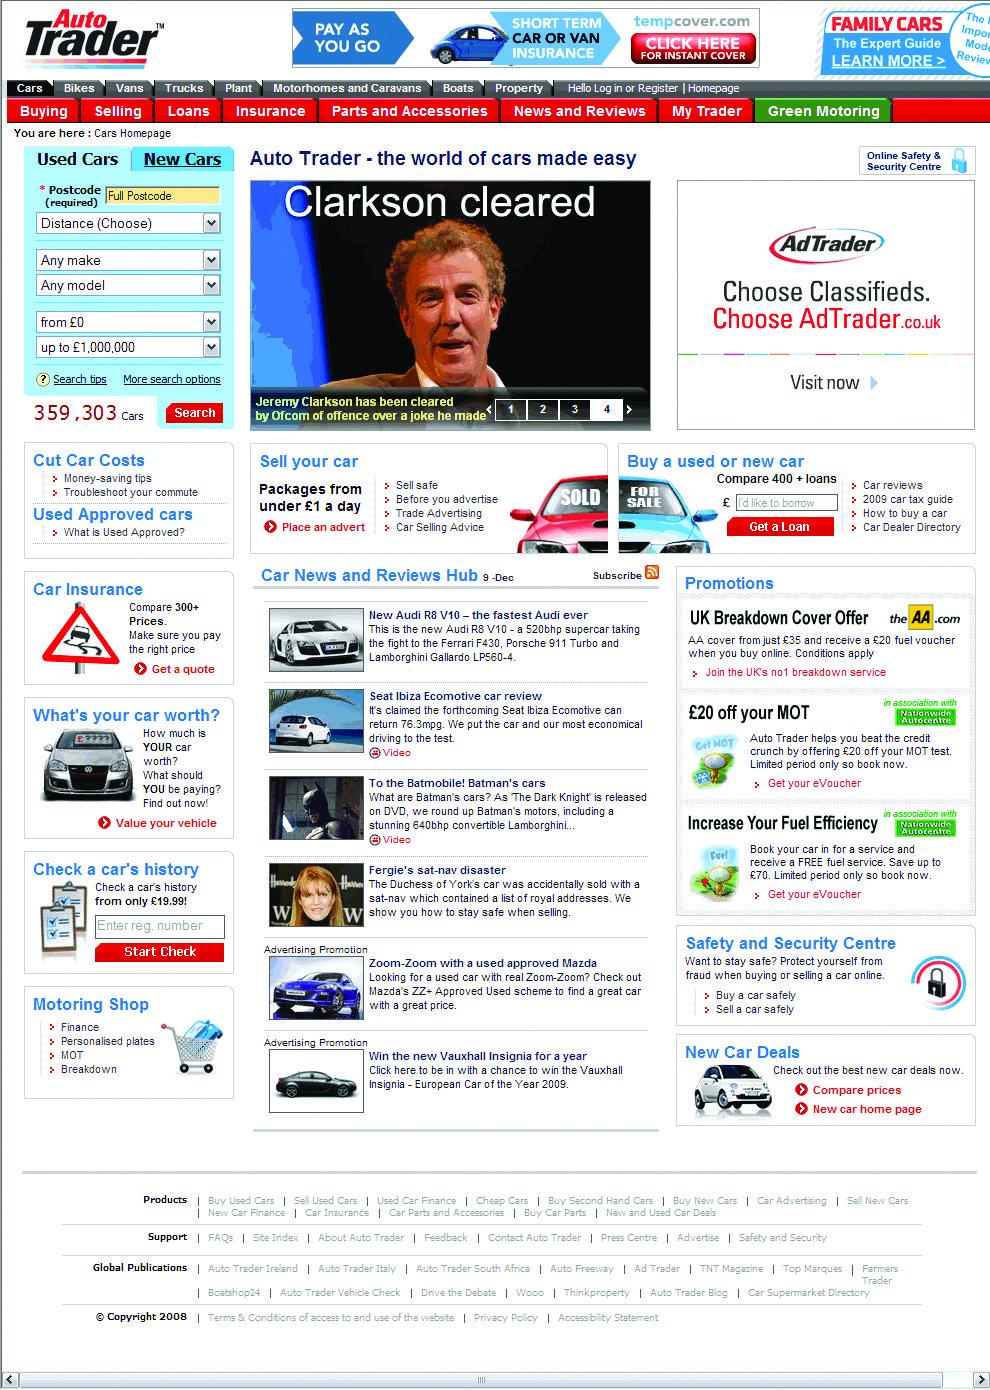 2008 AutoTrader.co.uk homepage | Auto Trader Heritage | Pinterest ...